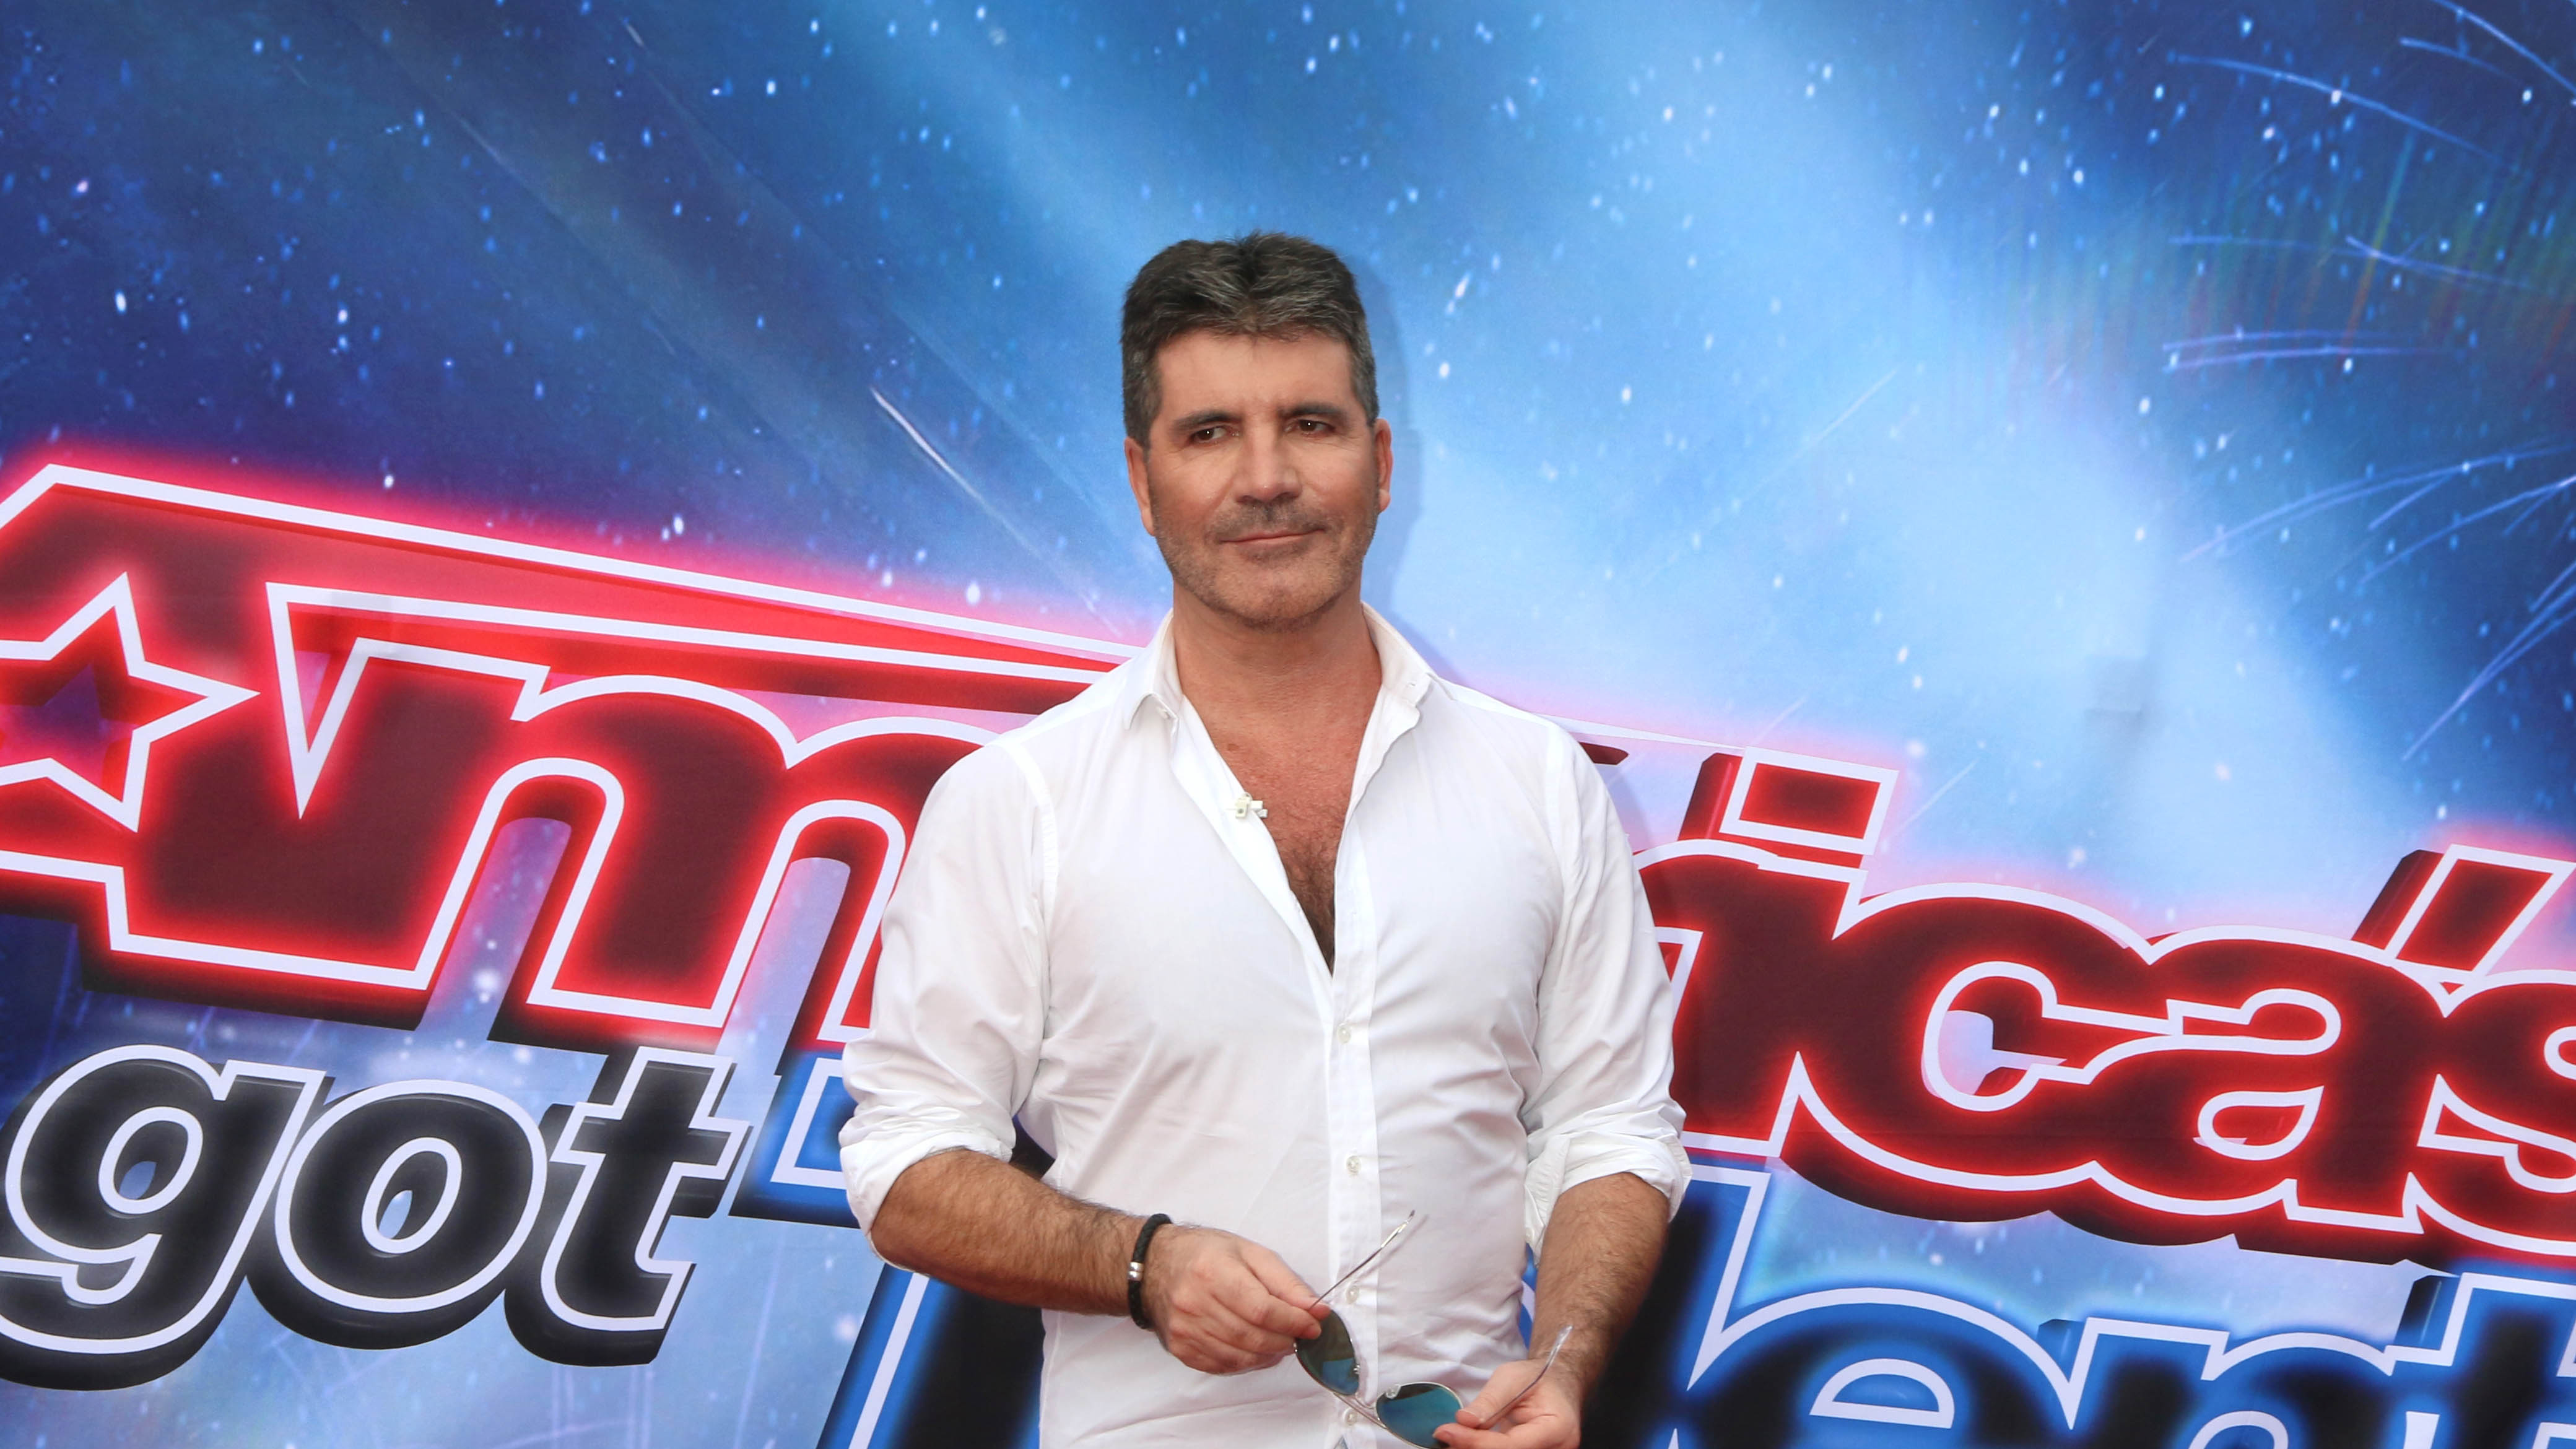 Simon Cowell Renews 'America's Got Talent' Deal With NBC